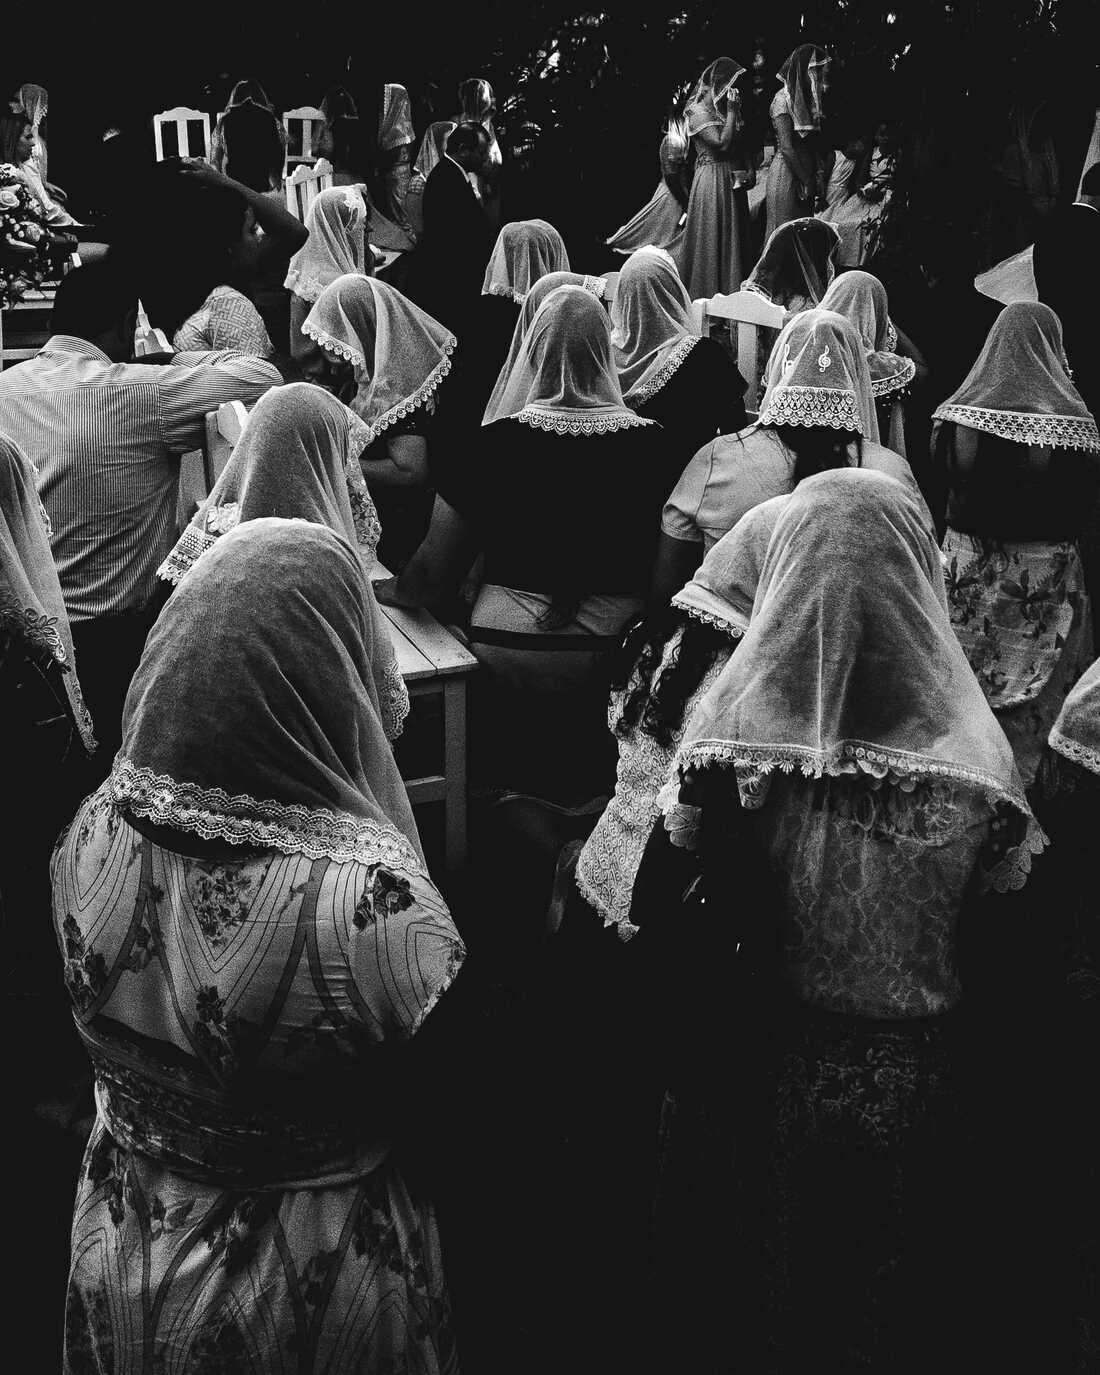 Guests at a religious wedding in Dourados, Mato Grosso do Sul, Brazil.